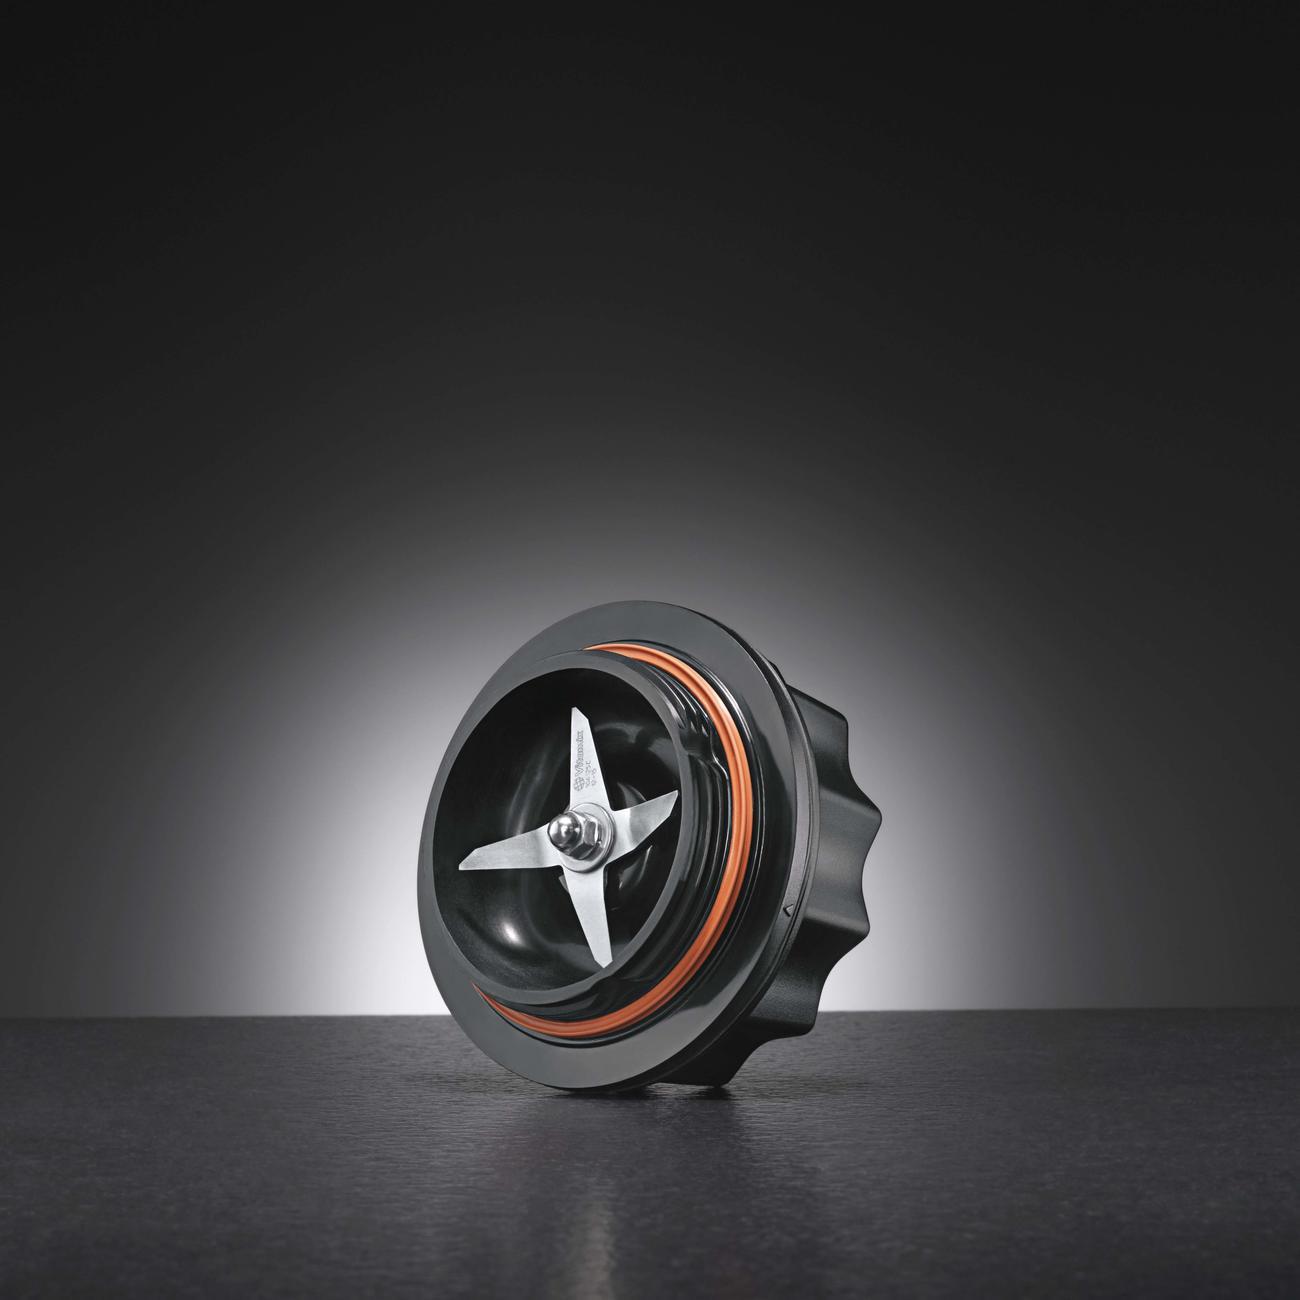 vitamix ascent a3500i 3 jahre garantie pro idee. Black Bedroom Furniture Sets. Home Design Ideas